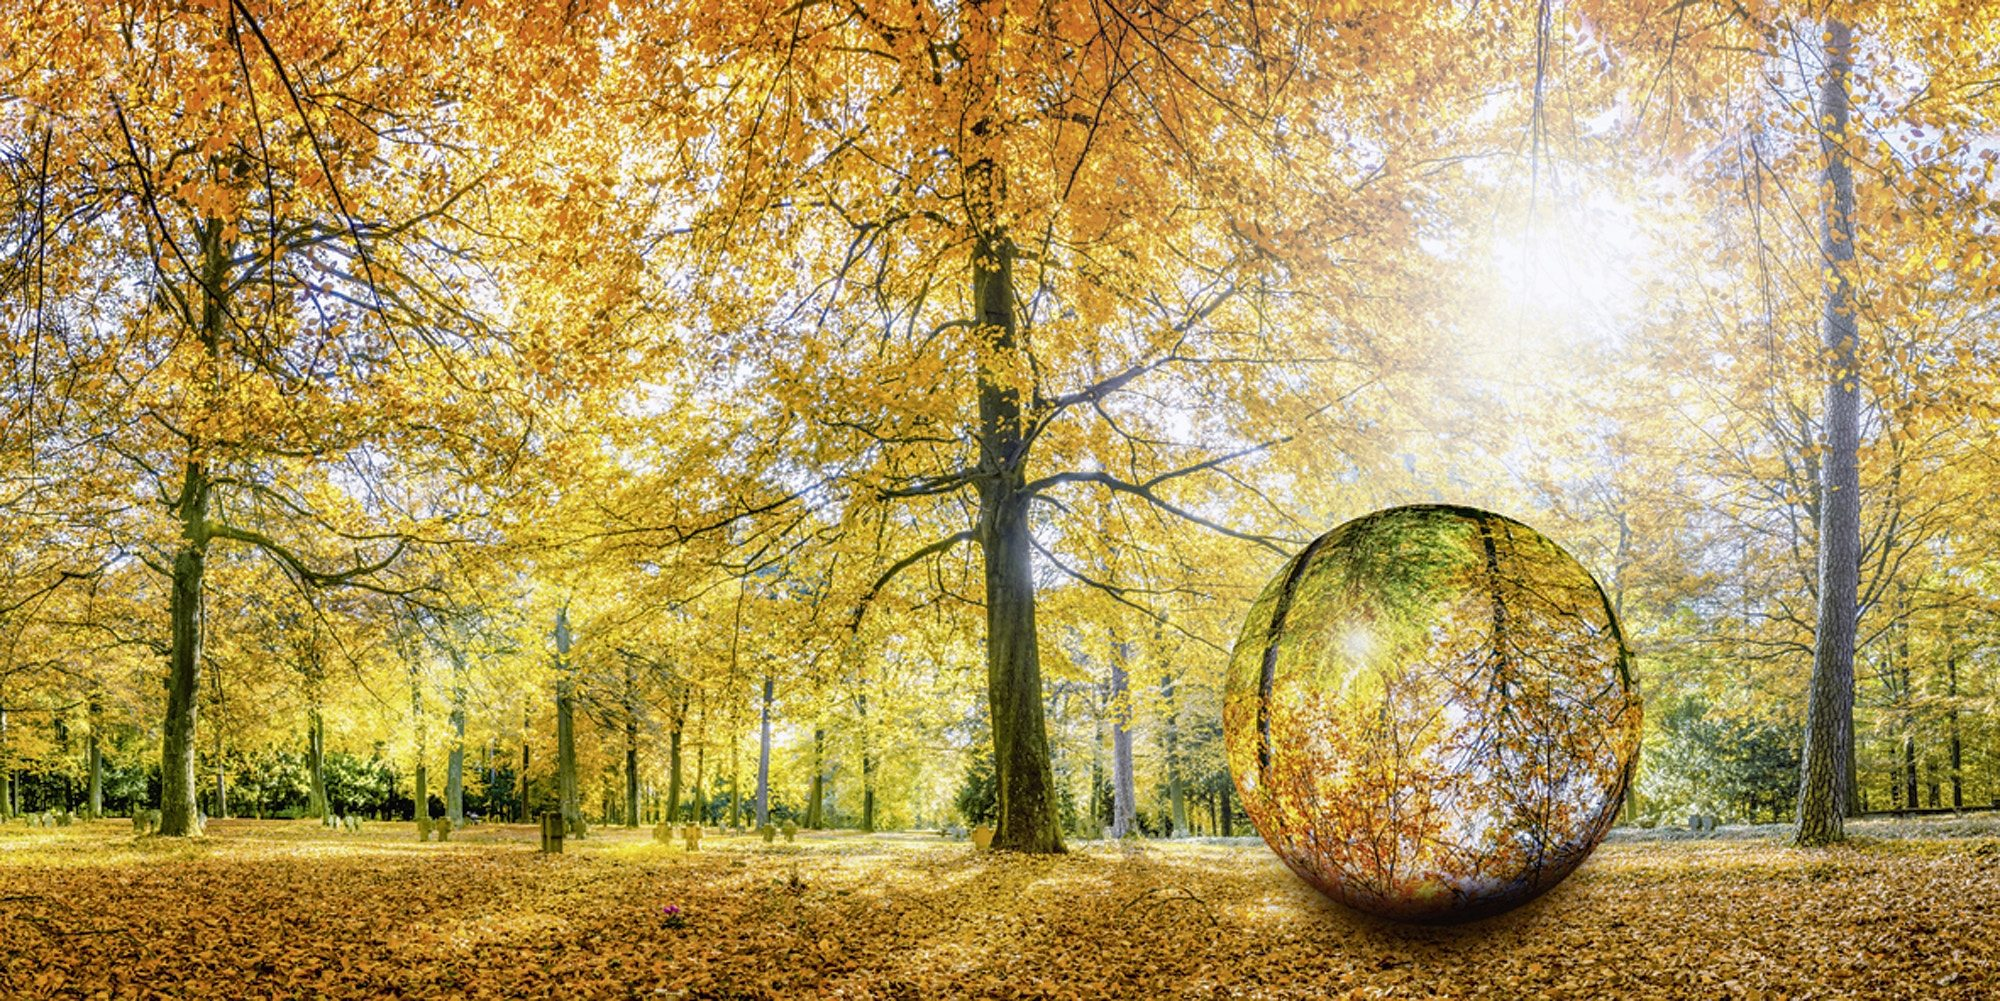 Home affaire Glasbild »eyetronic: Herbstwald Panorama - Glaskugel«, 100/50 cm